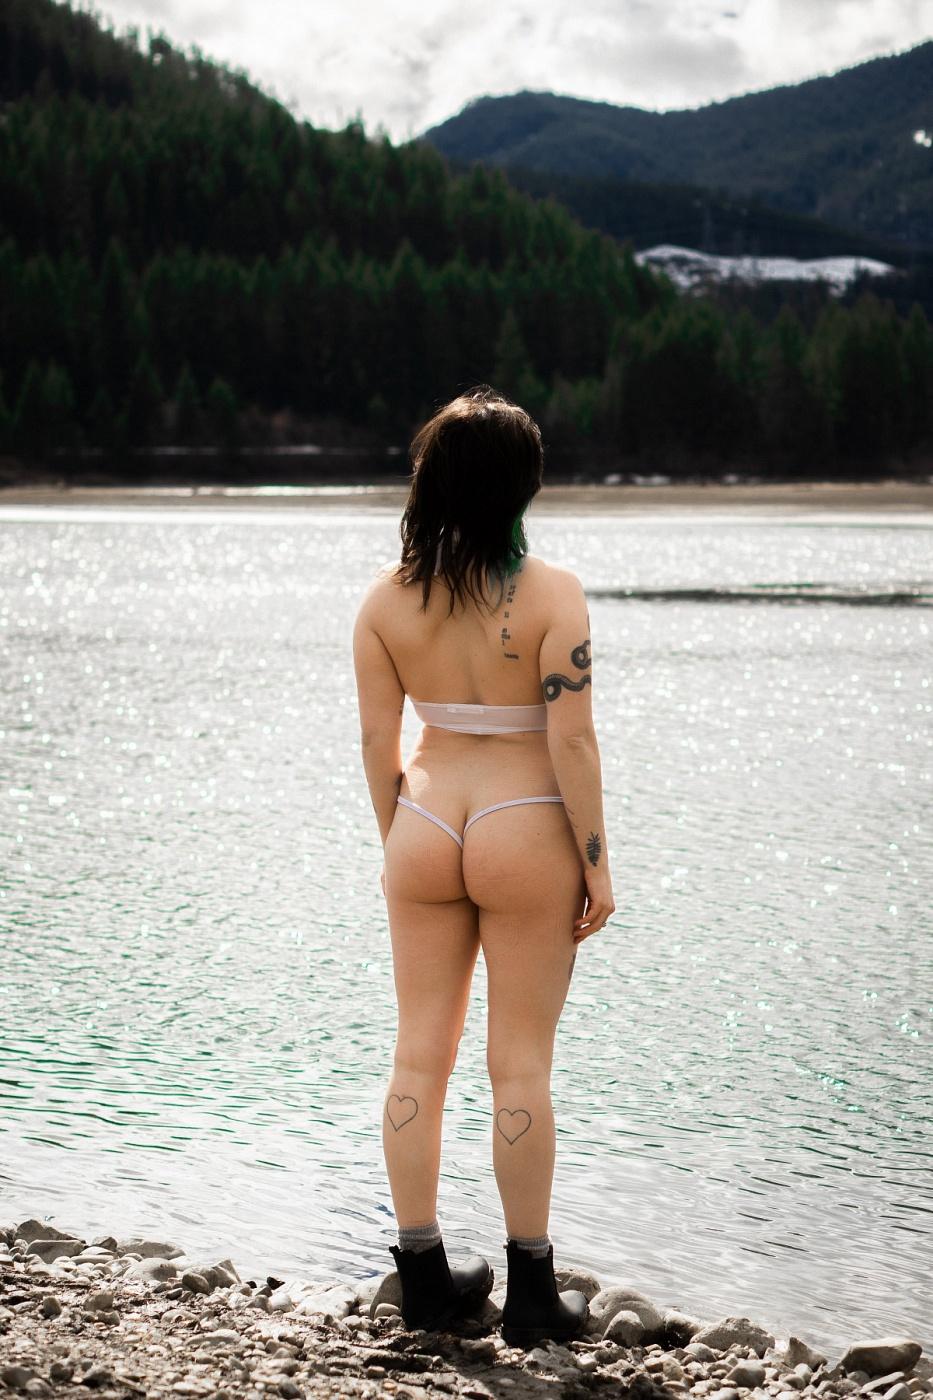 Simone Solnsa